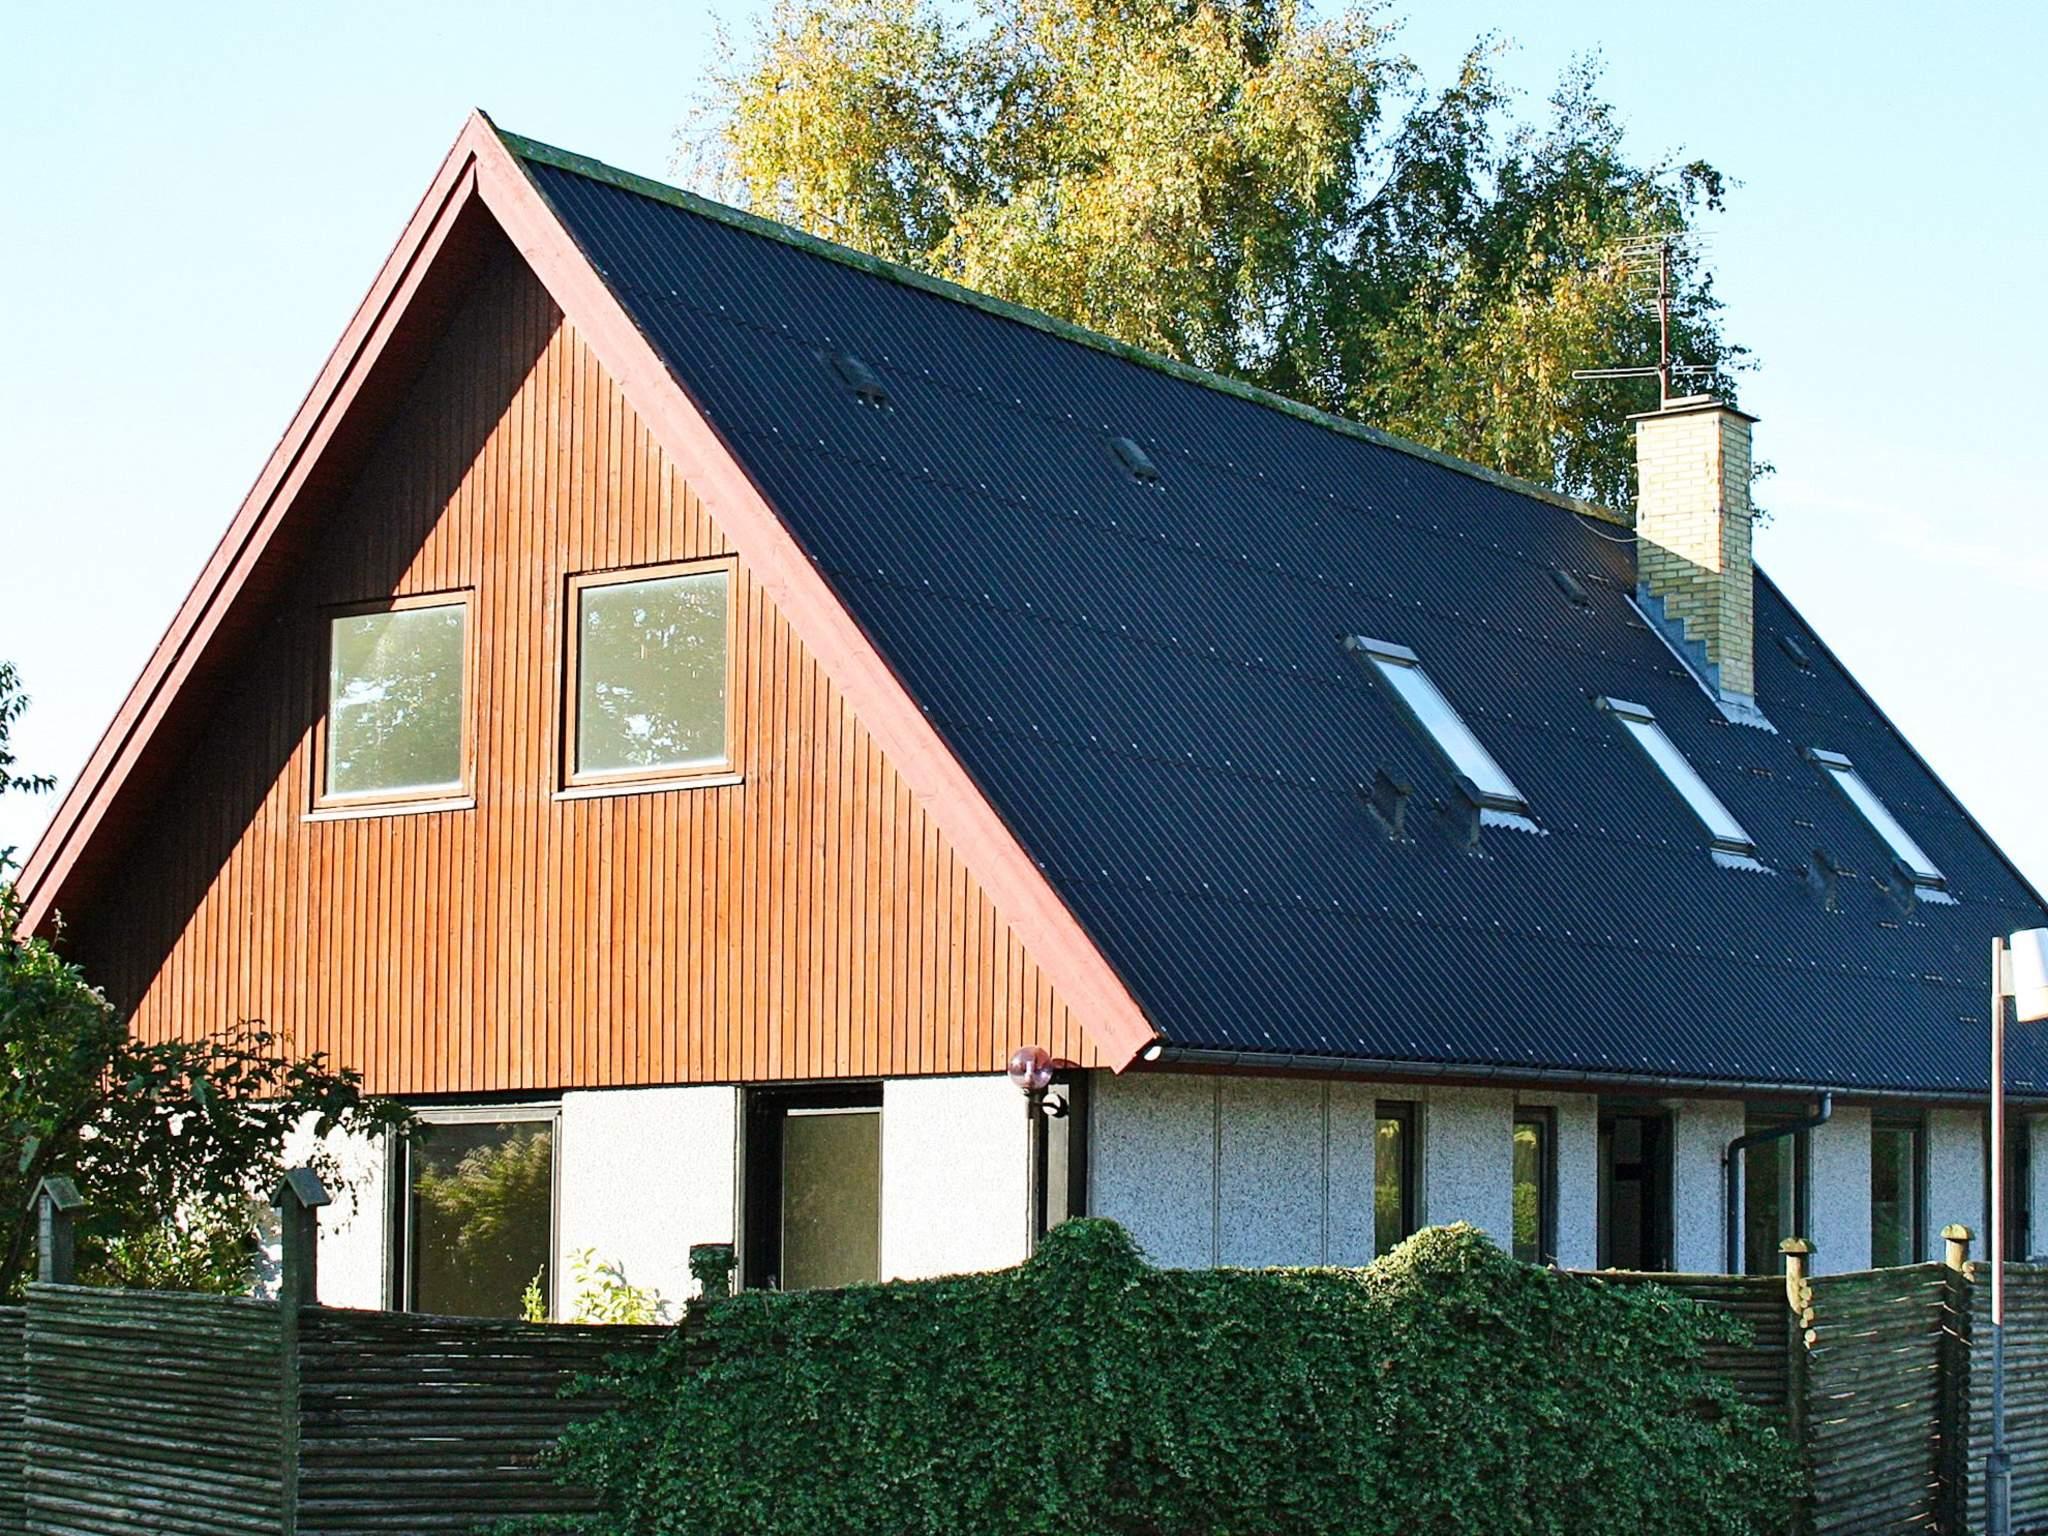 Ferienhaus Balka Strand (921368), Balke, , Bornholm, Dänemark, Bild 22